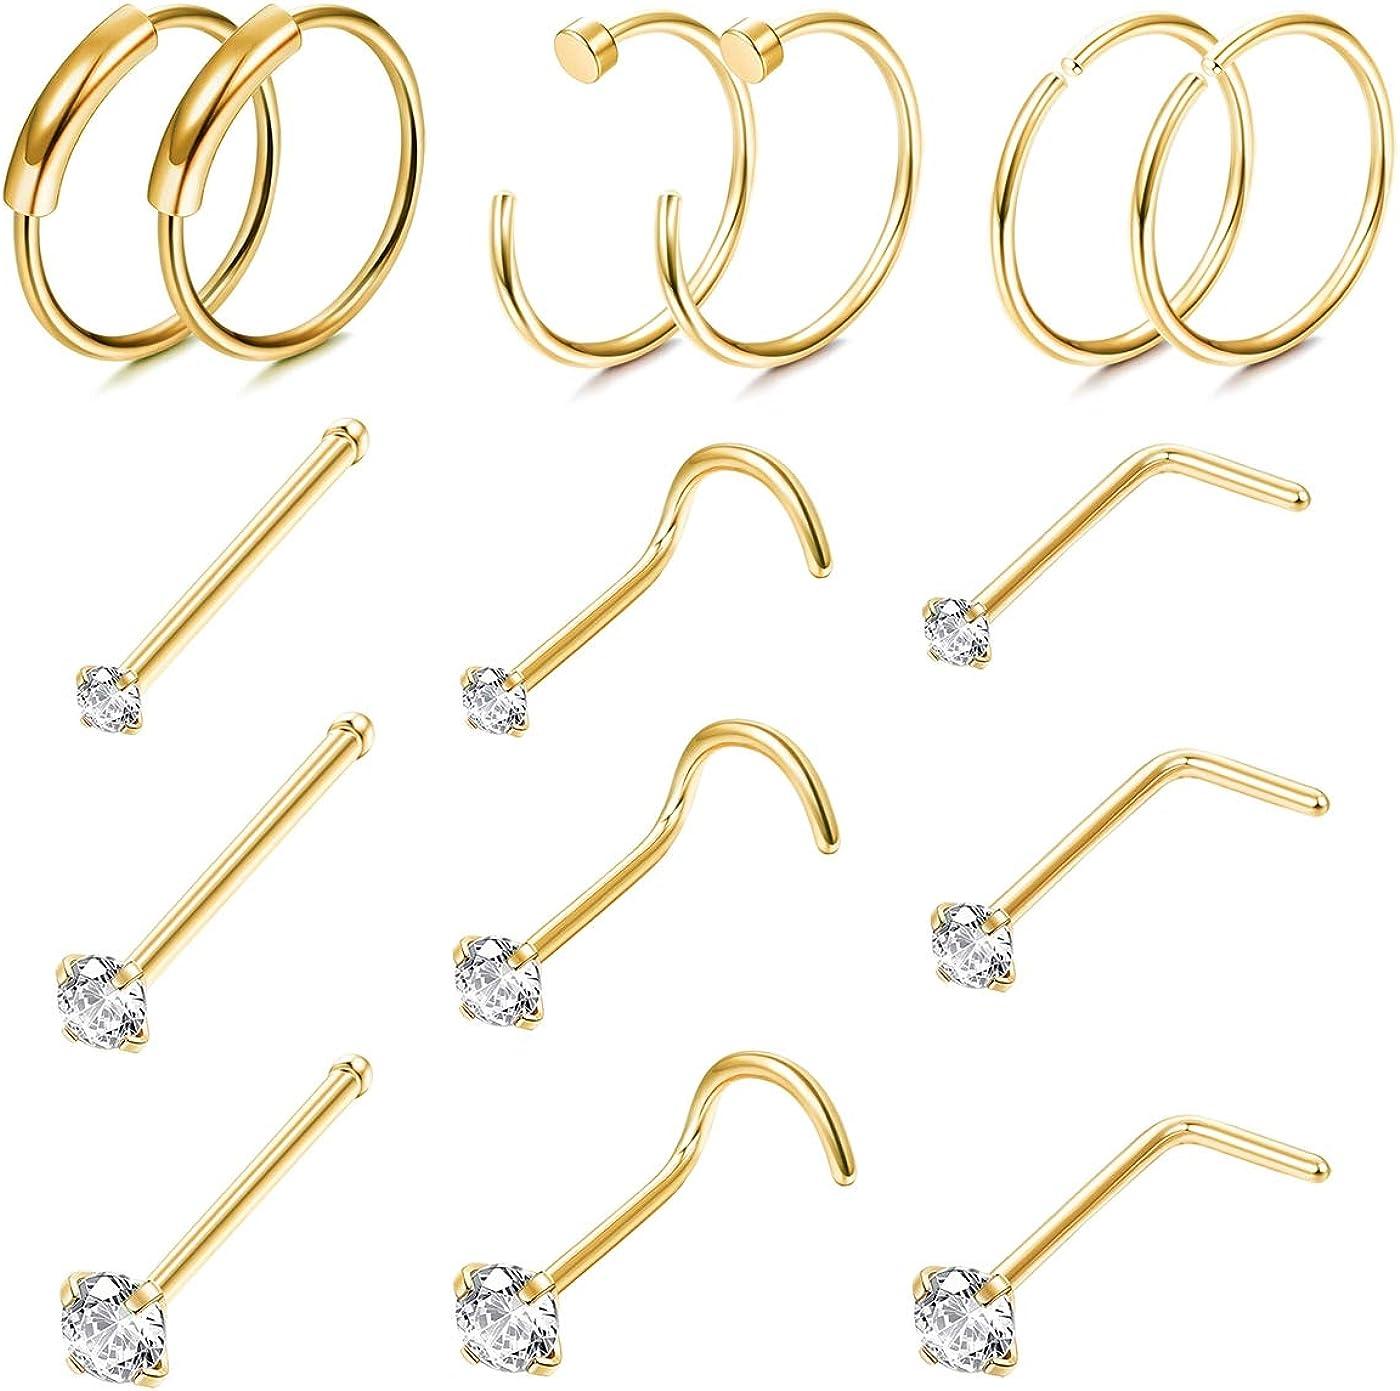 FINREZIO 15PCS 22G Surgical Steel Nose Rings Hoop Studs Cartilage Earrings Body Piercing Jewelry 1.5mm 2mm 2.5mm CZ